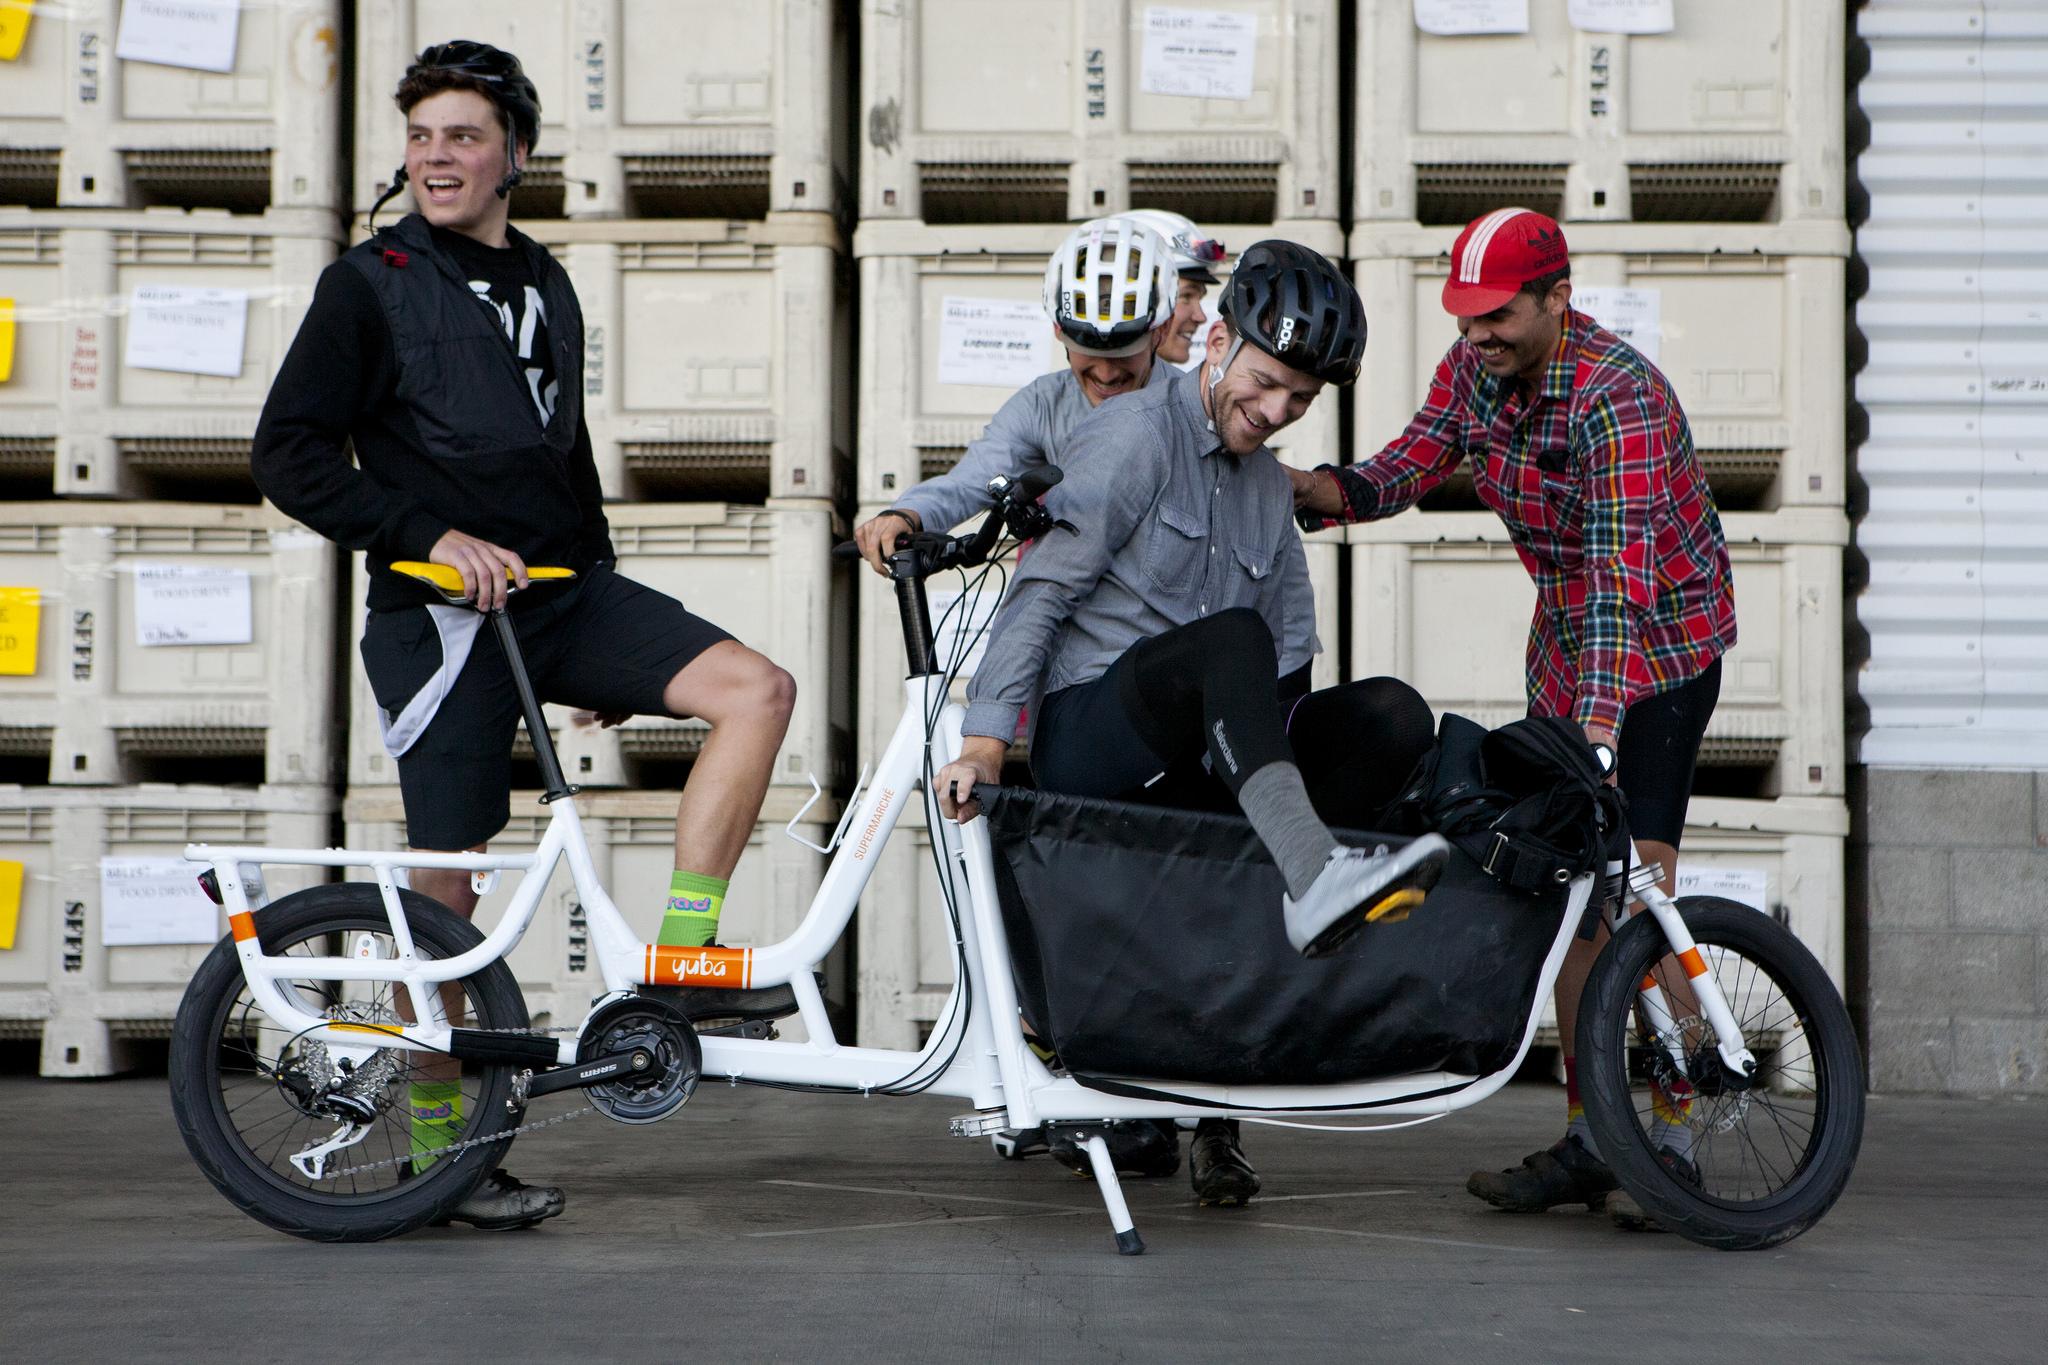 Team No Yer Squad (Matthew Wiebe, Ryan Schaub, Jake Perkins, Tim Hart, Naveen Molloy). Photo by Jonathan Koshi